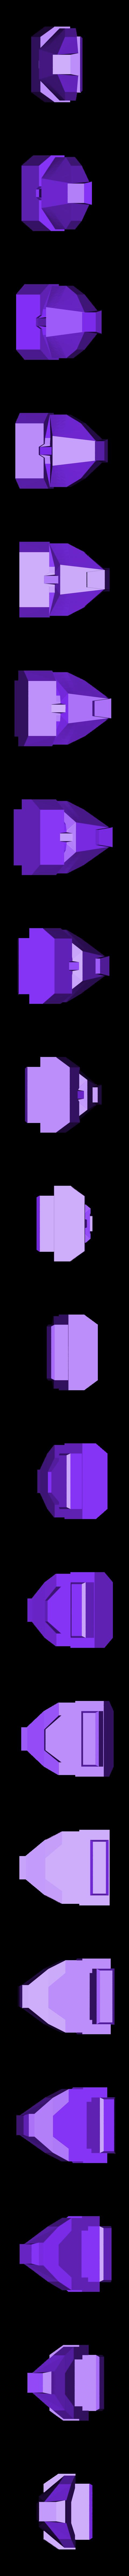 Headface2.stl Download STL file KO TFC Uranos Upgrade Kit IDW Ver • 3D printer object, Toymakr3D